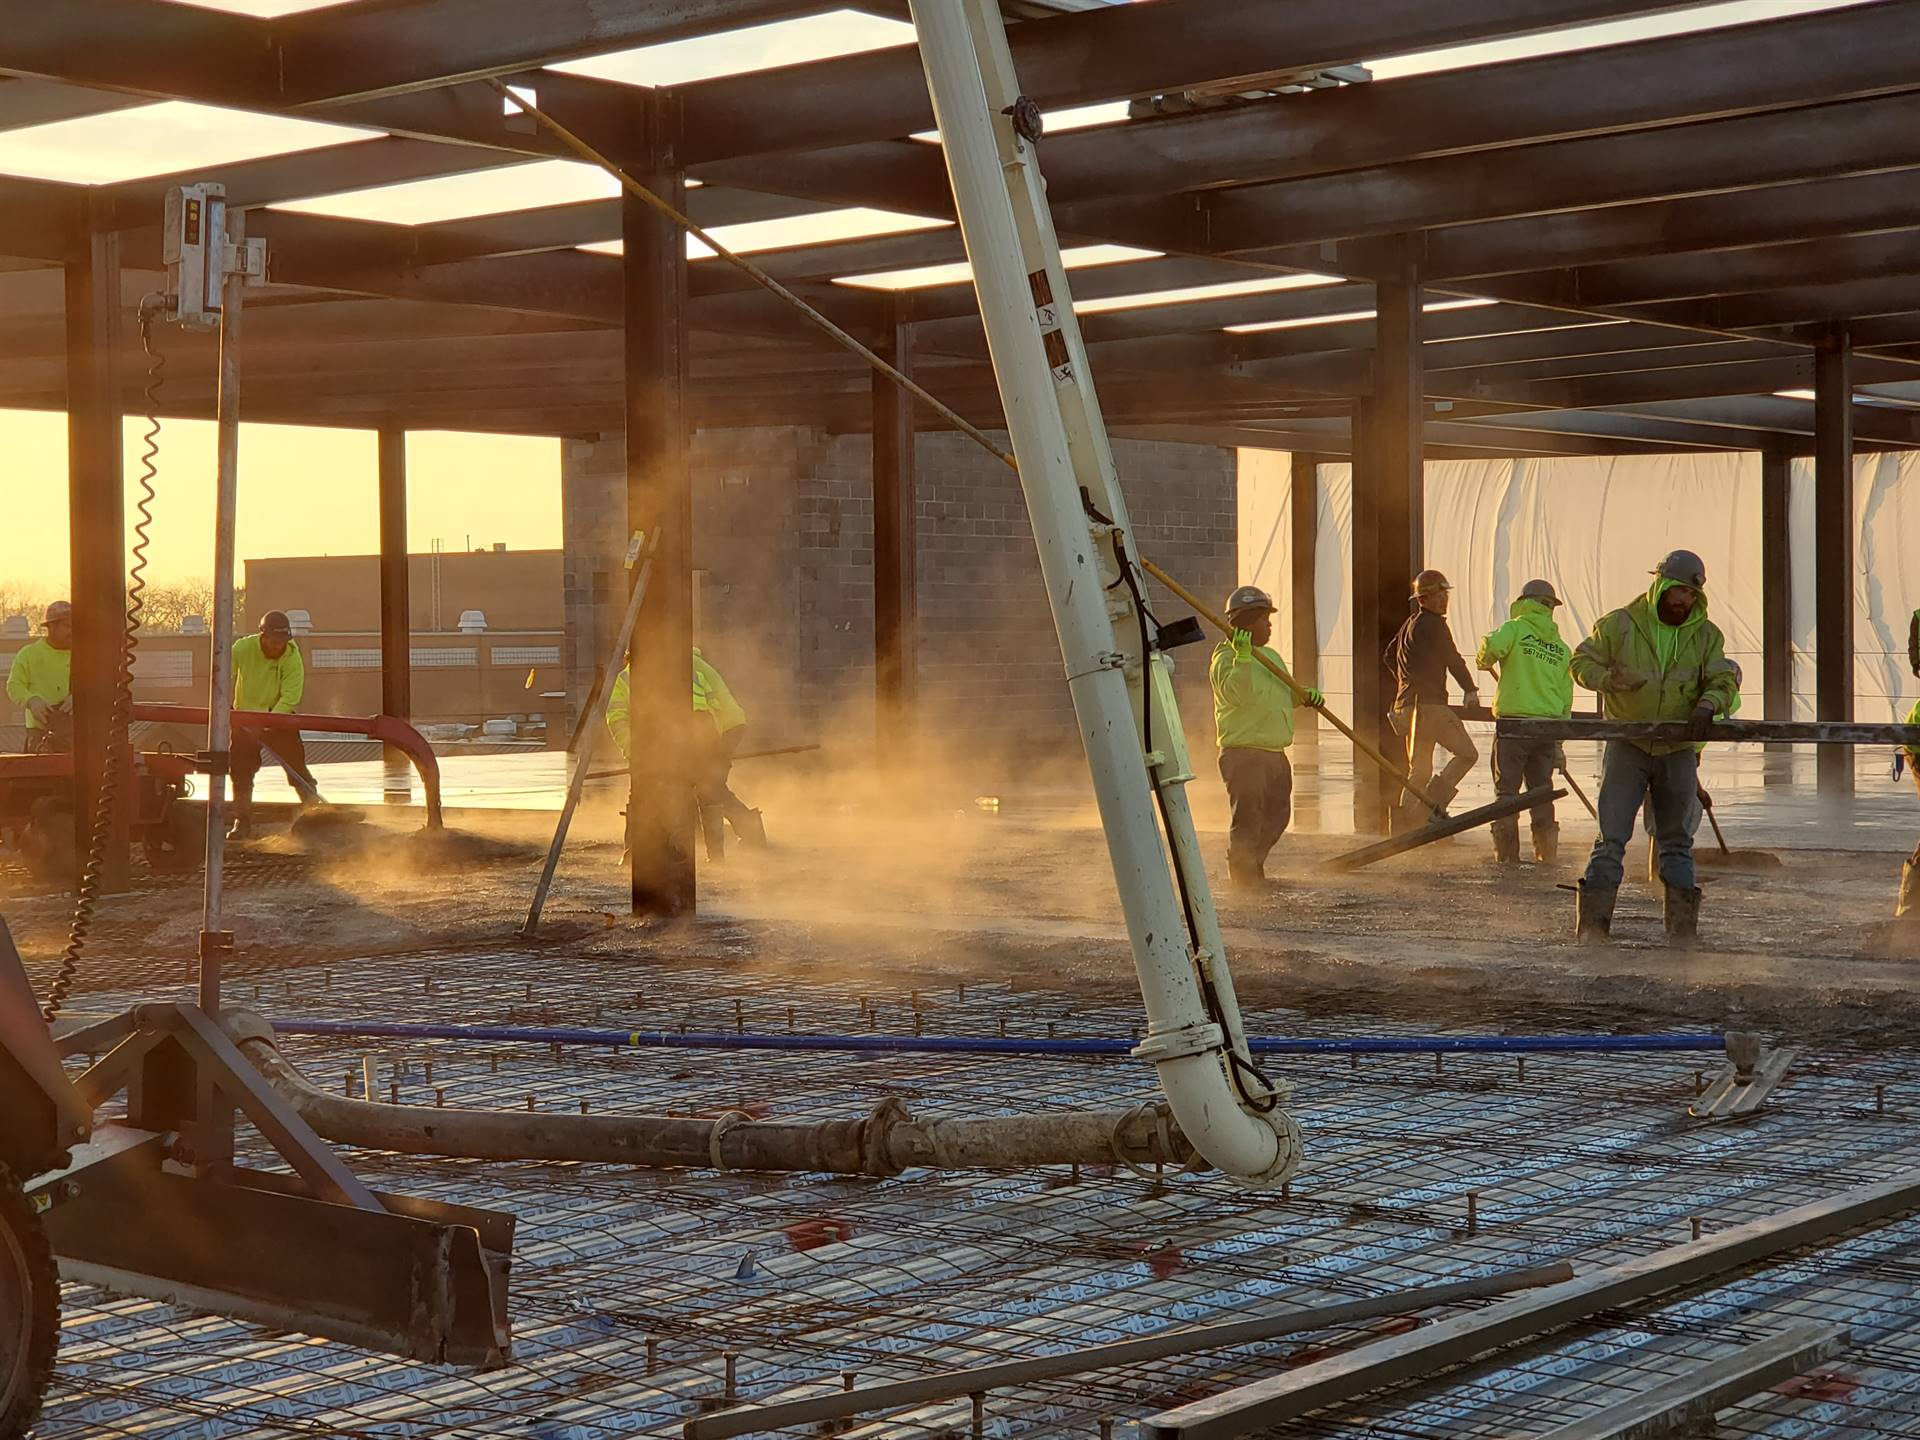 Third floor academic area pouring concrete decking